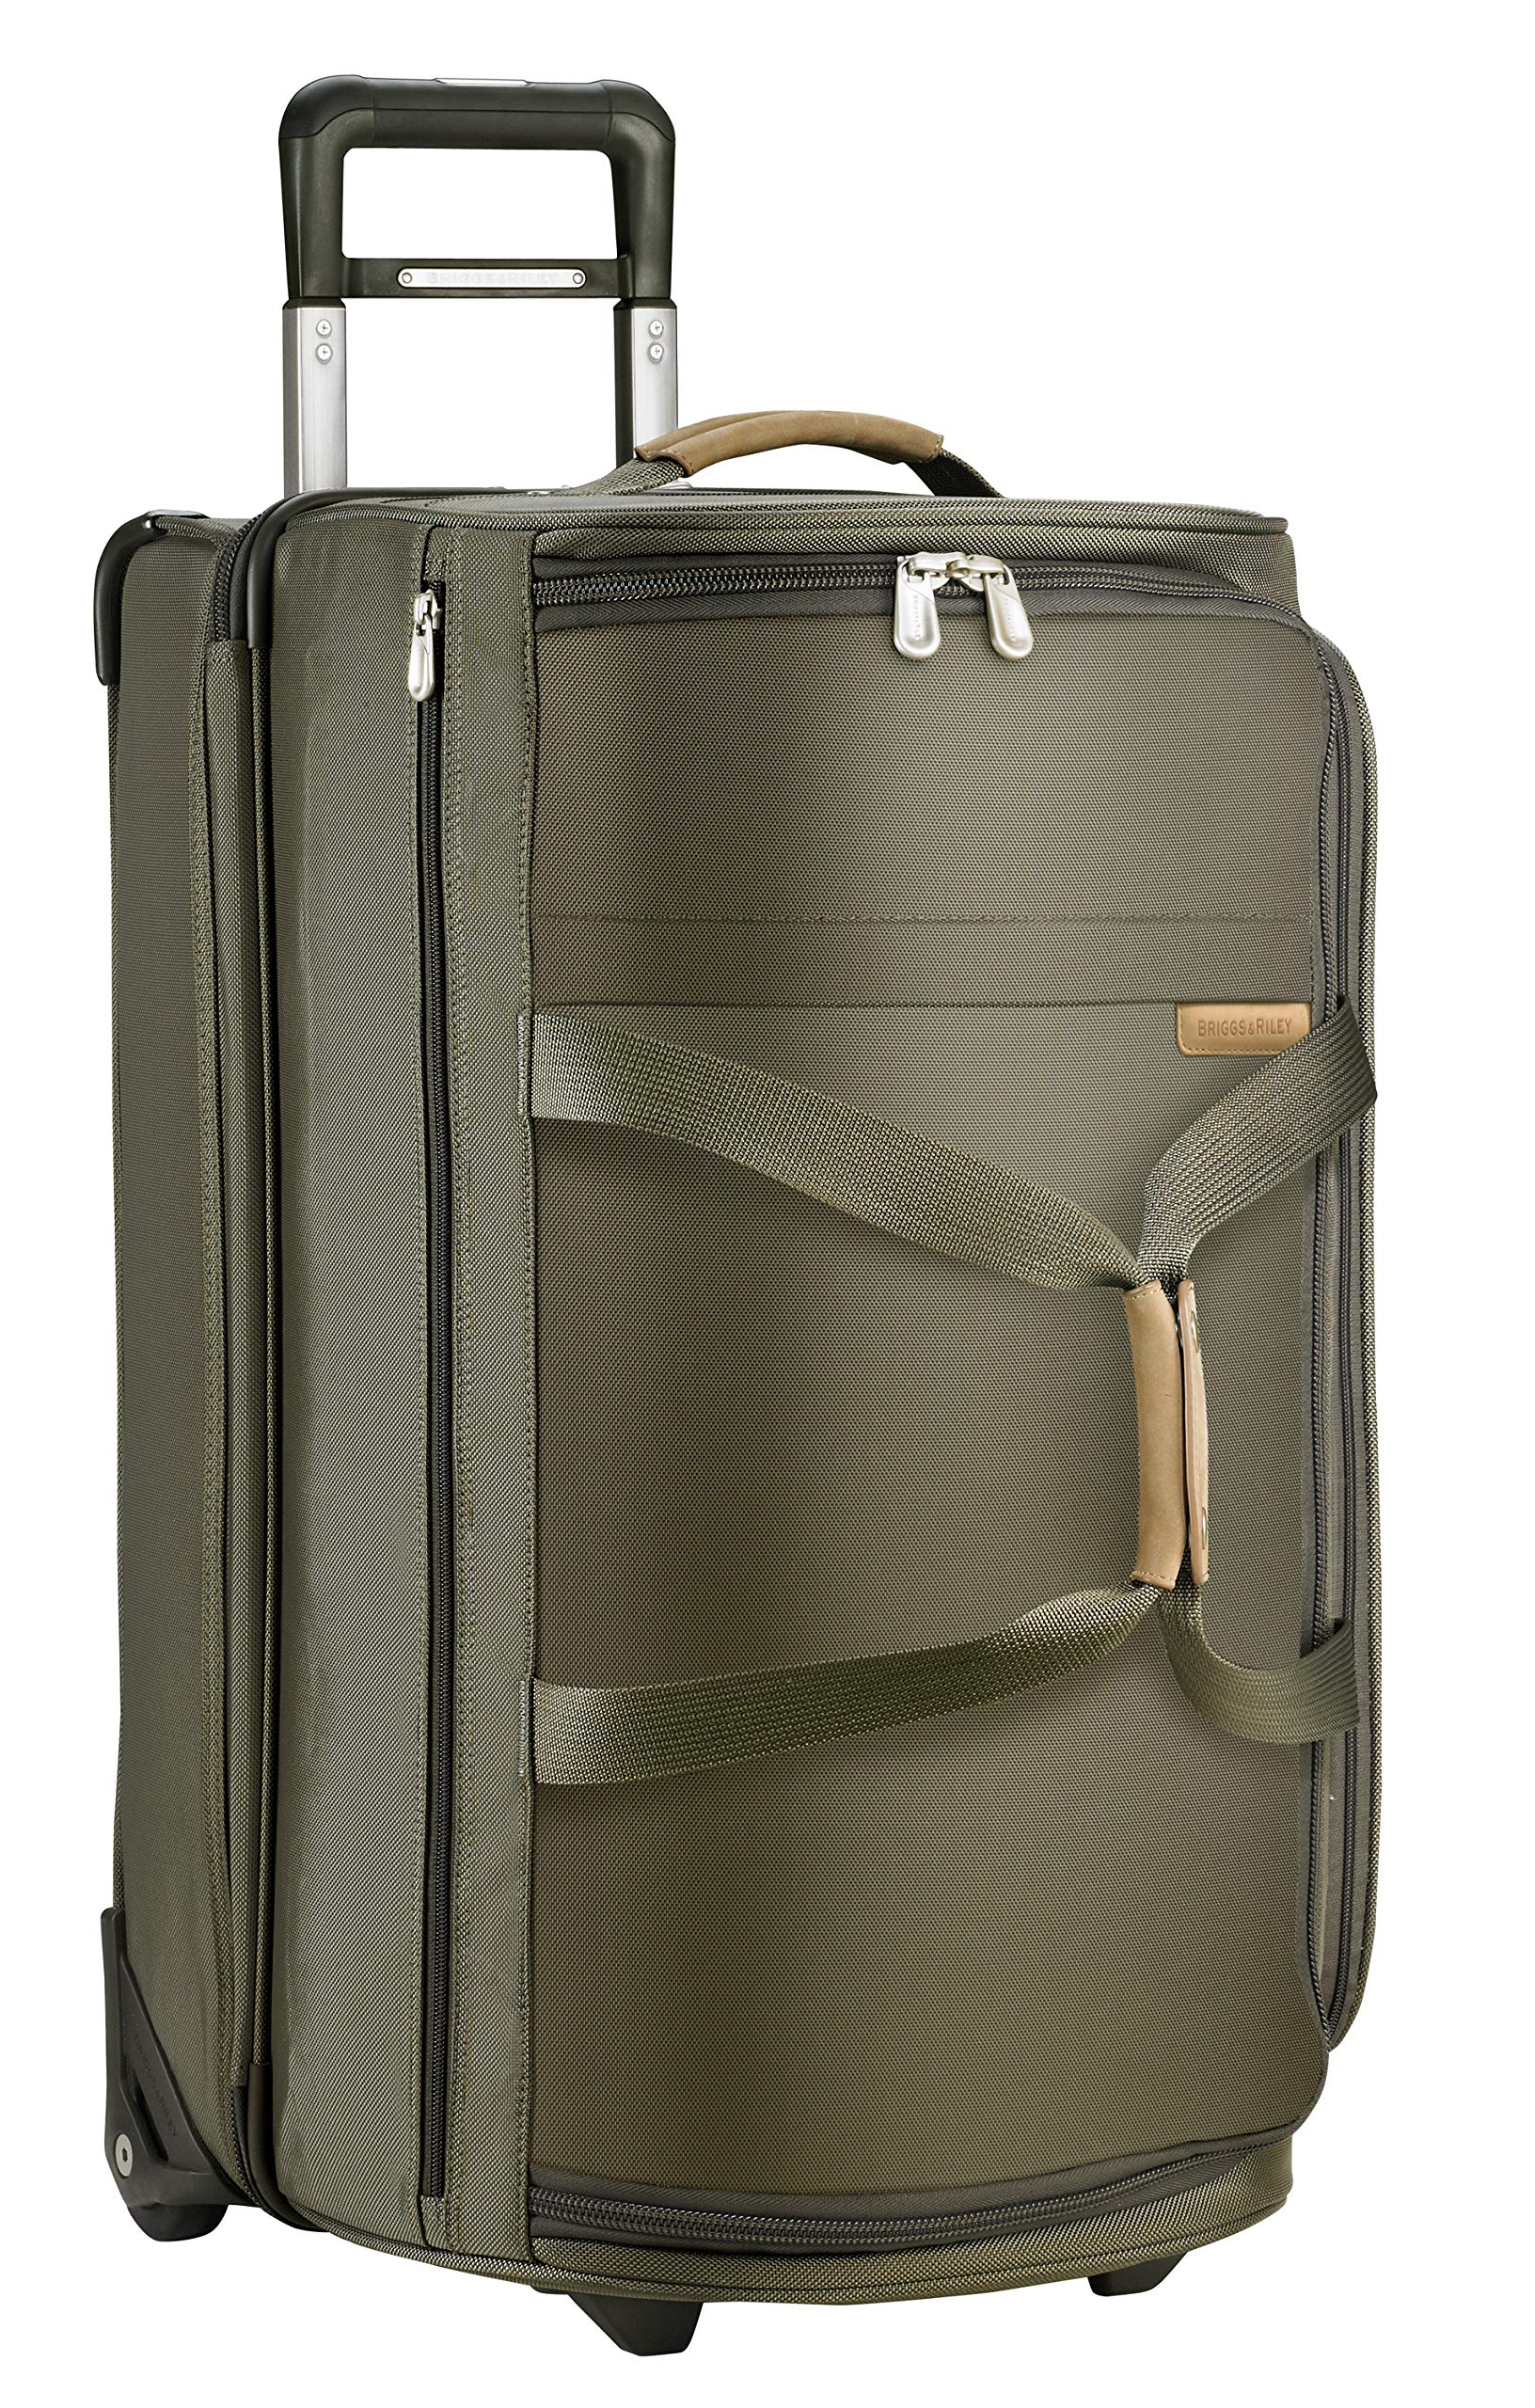 Briggs & Riley Baseline Upright Duffle Bag, Olive, Medium